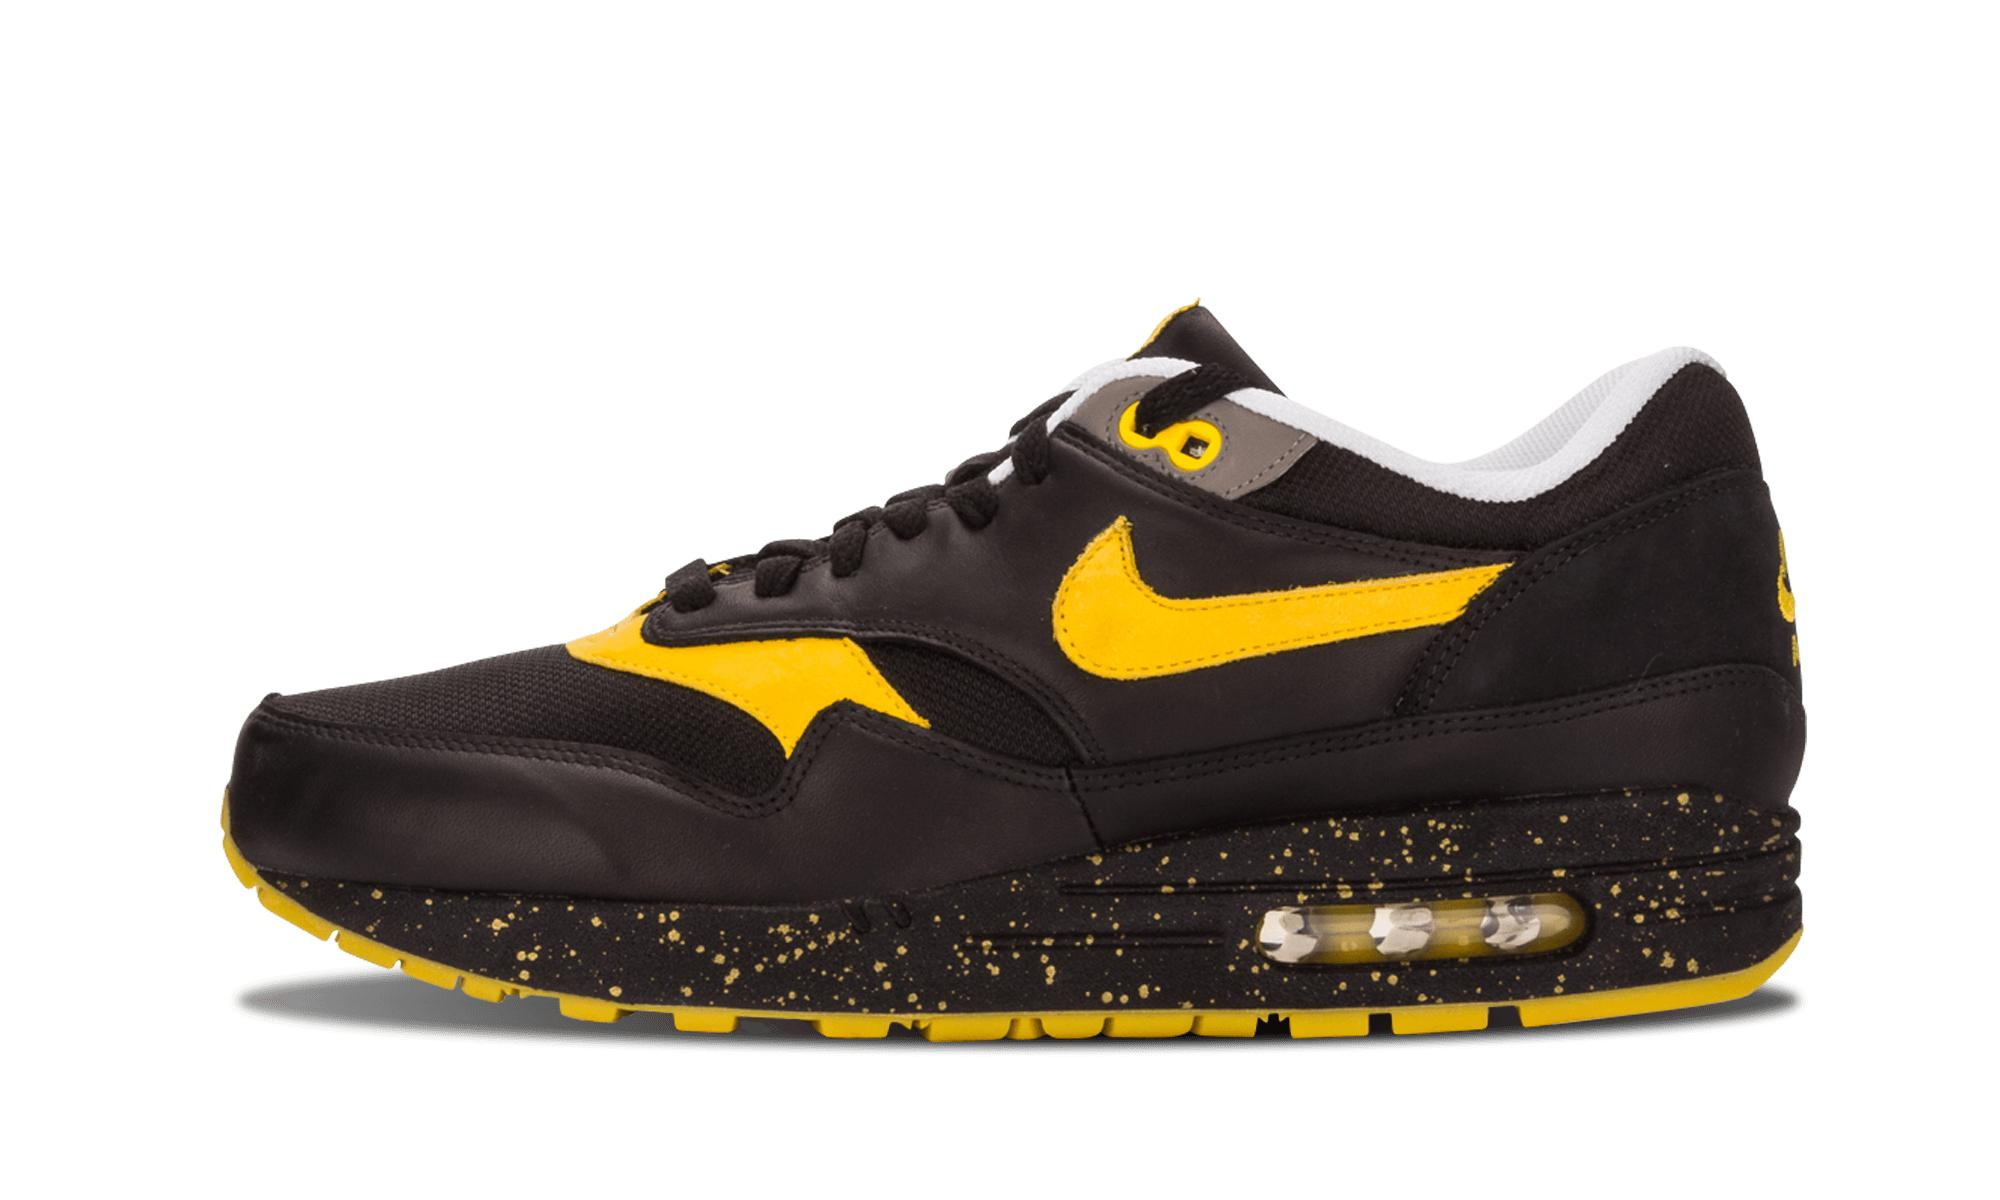 check out 20ba7 e4d44 Lyst - Nike Air Max 1 Premium Tz Laf for Men